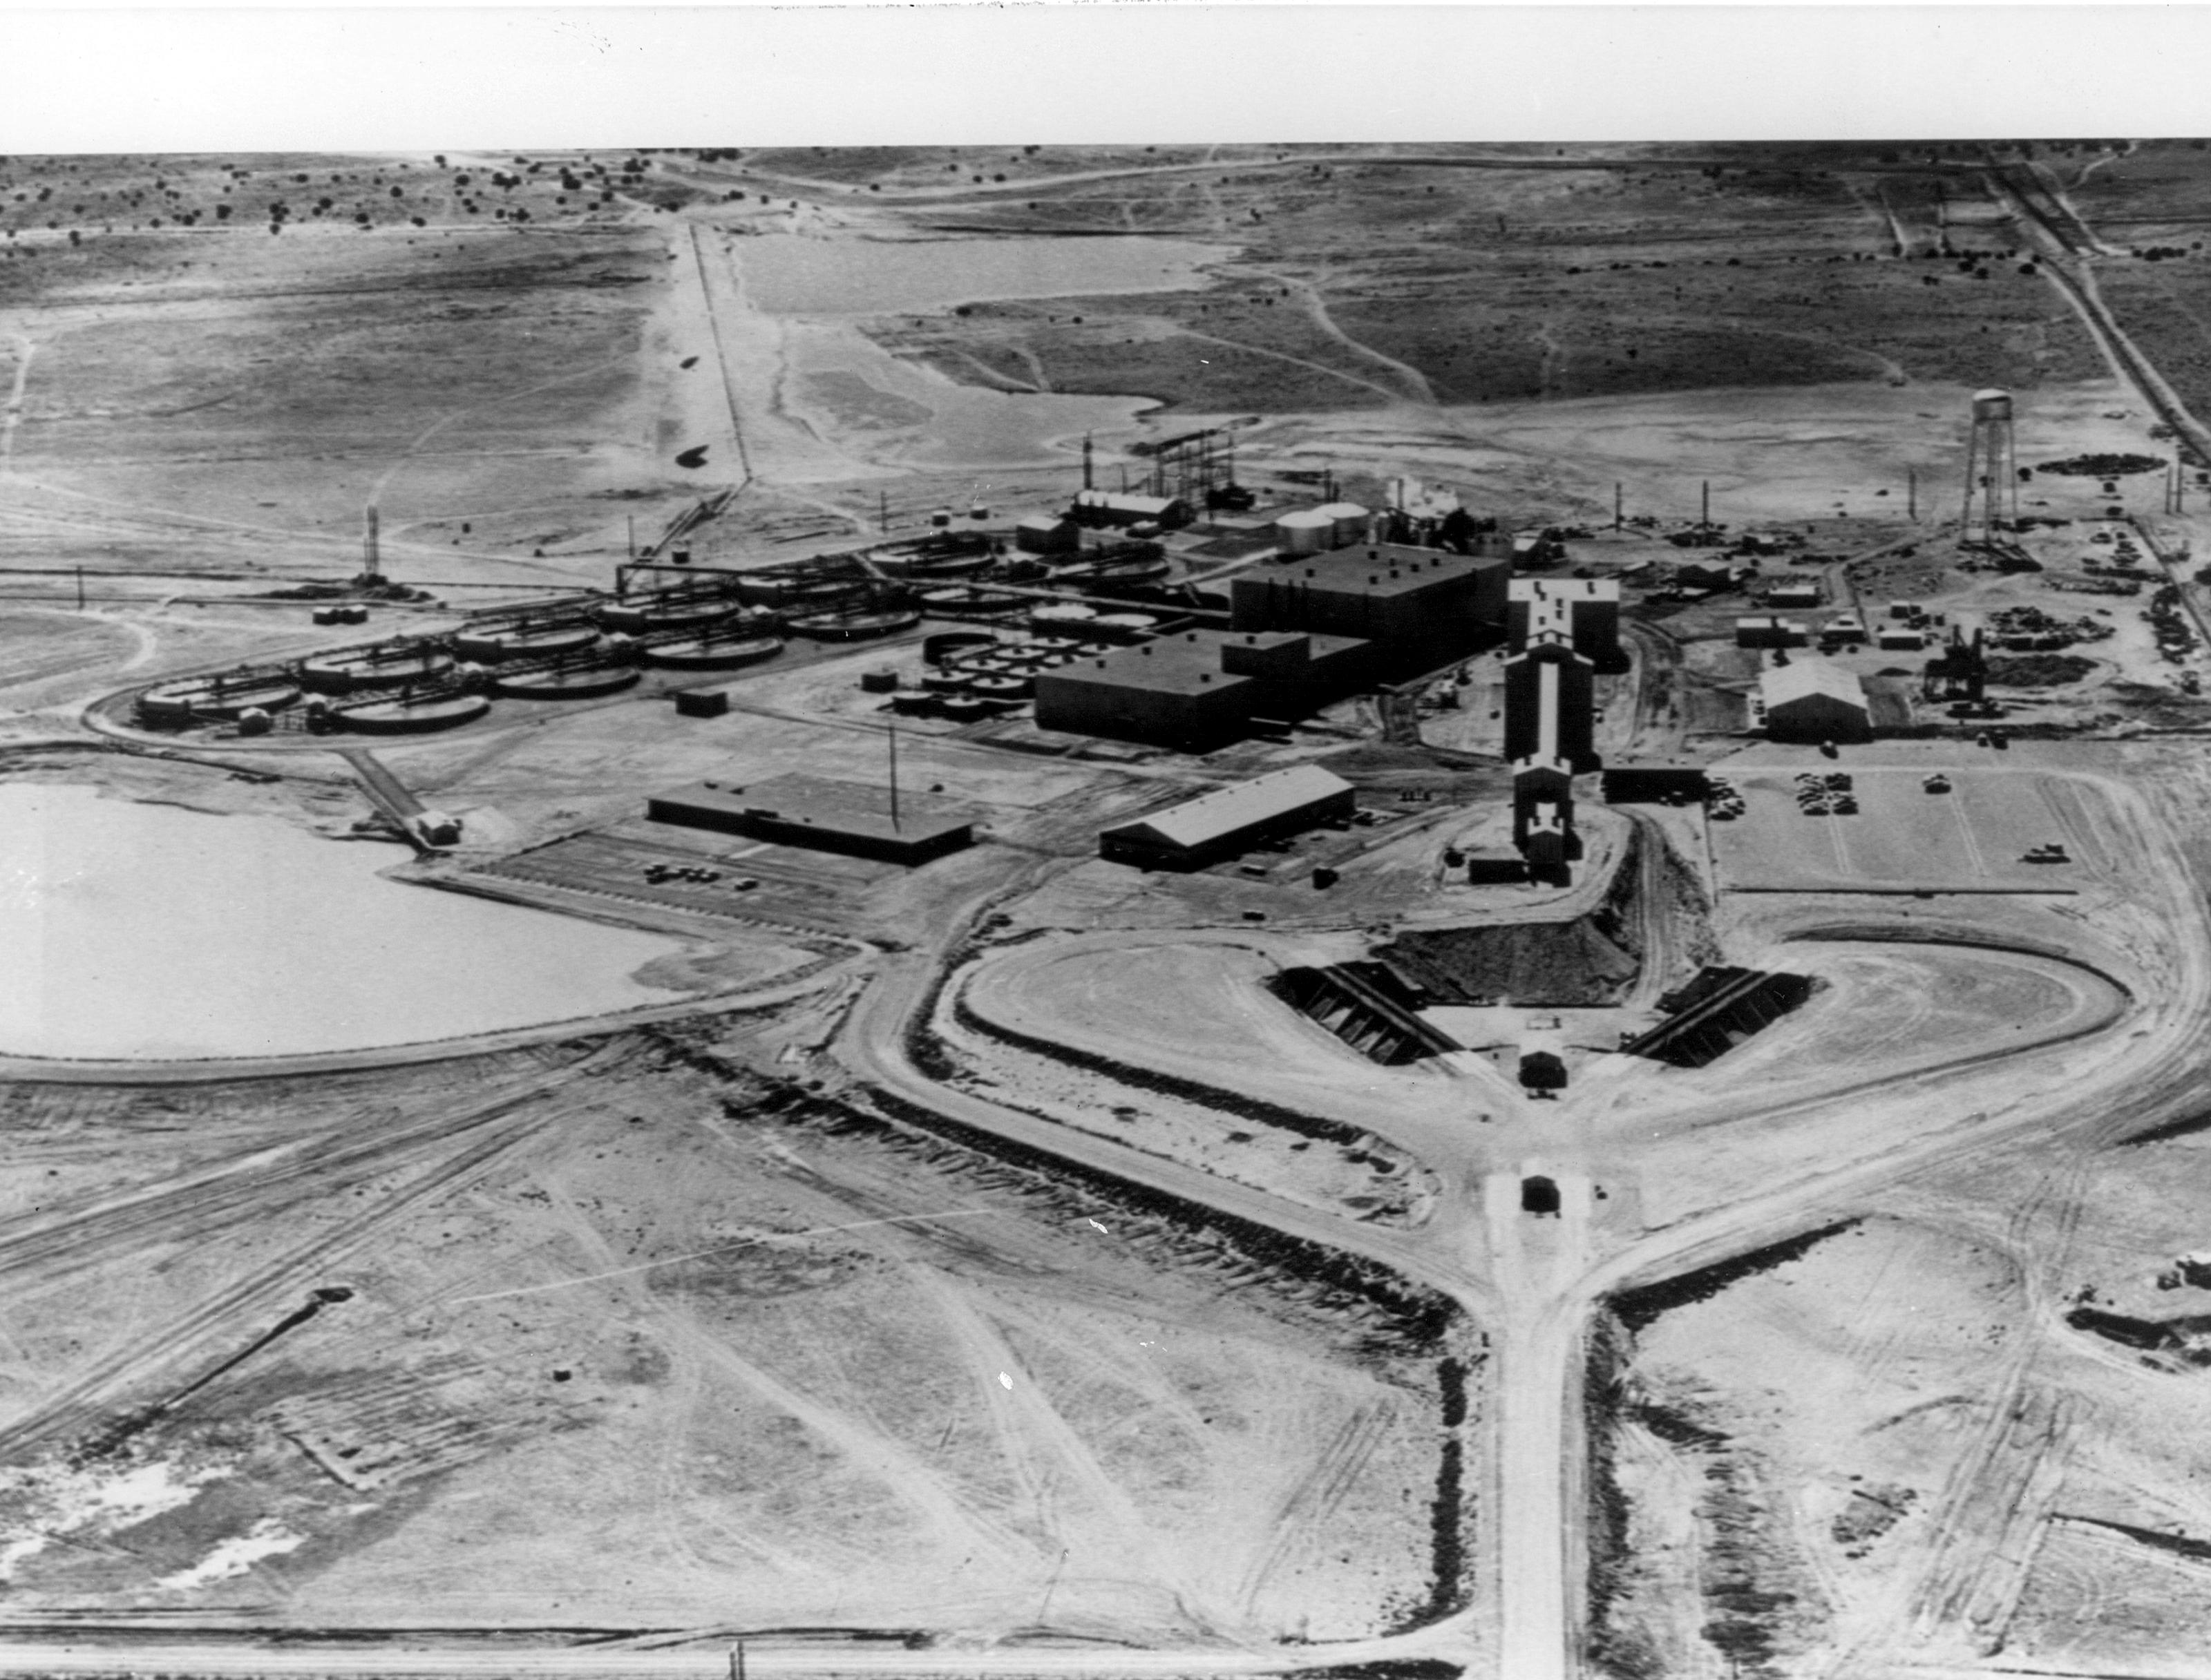 https://upload.wikimedia.org/wikipedia/commons/4/43/Kerr-McGee_Uranium_mill,_Grants_NM.jpg